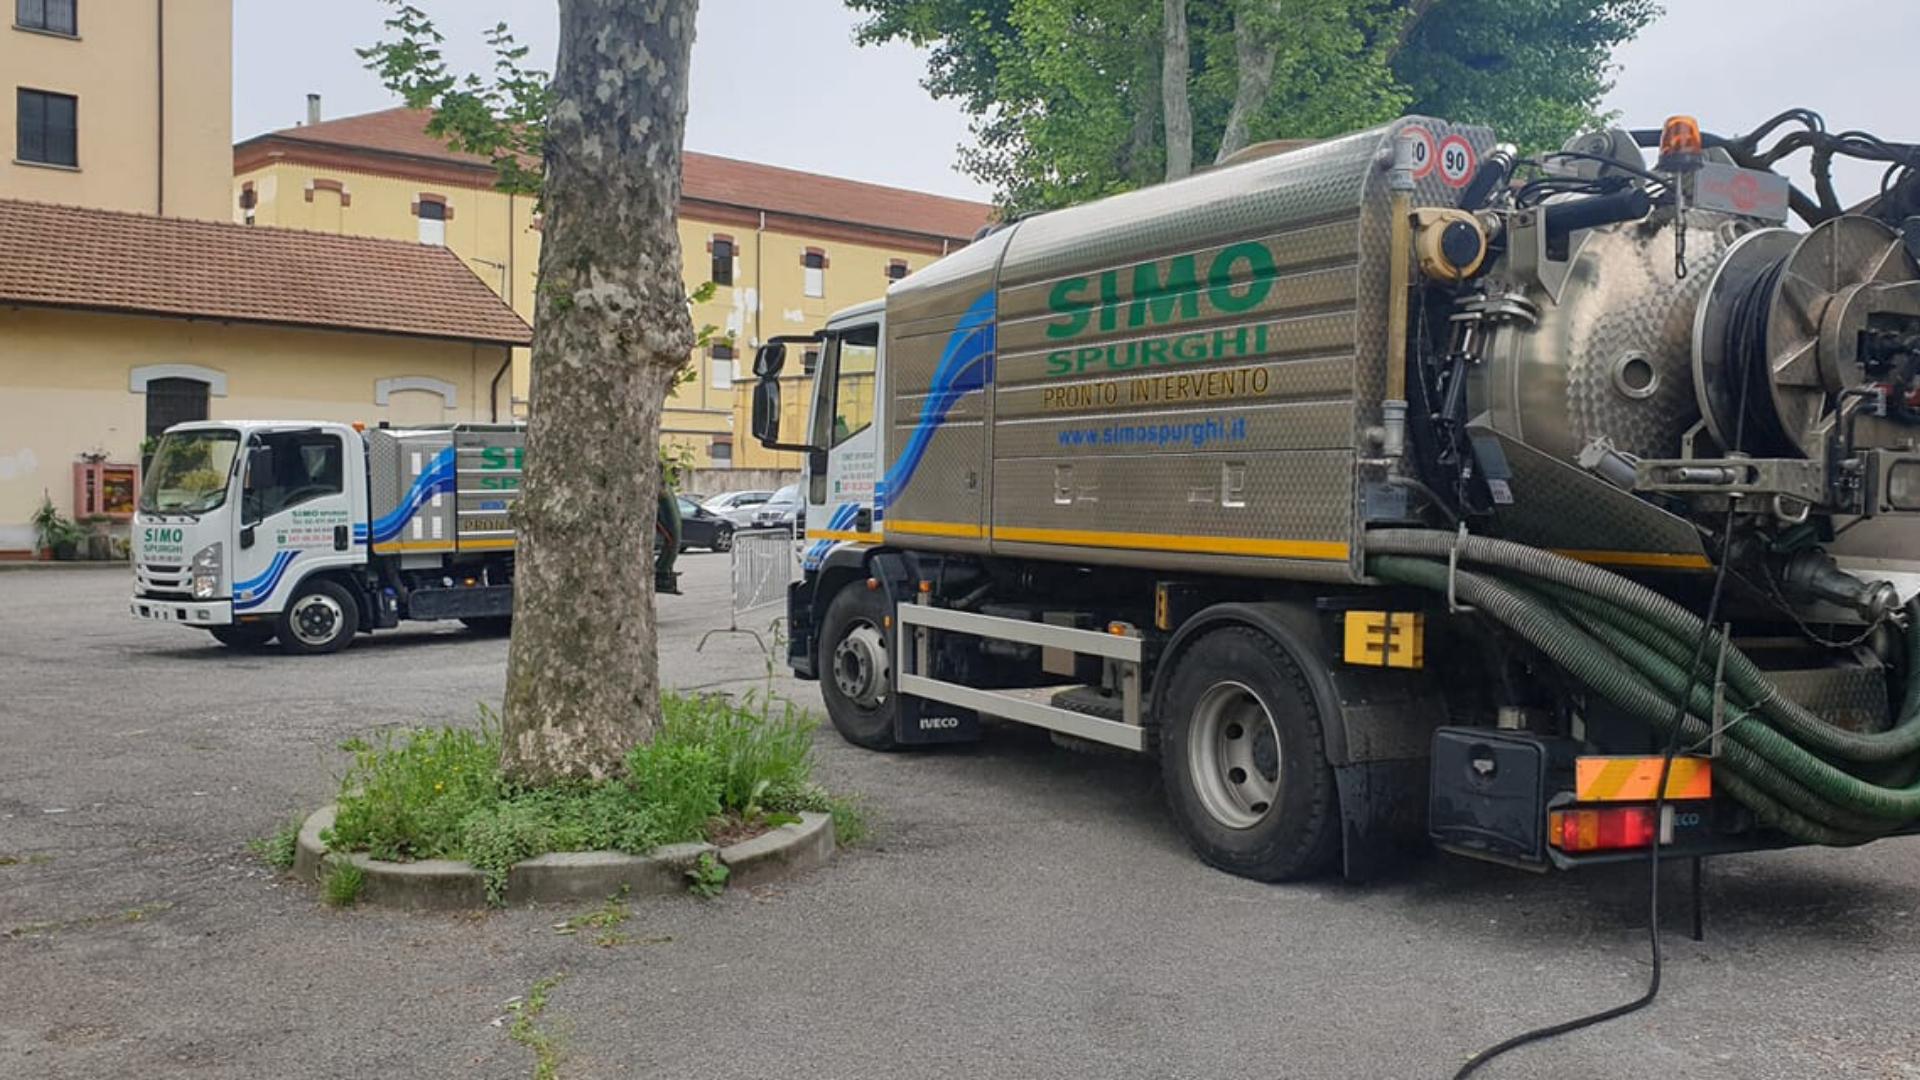 Ditta di Spurghi Milano